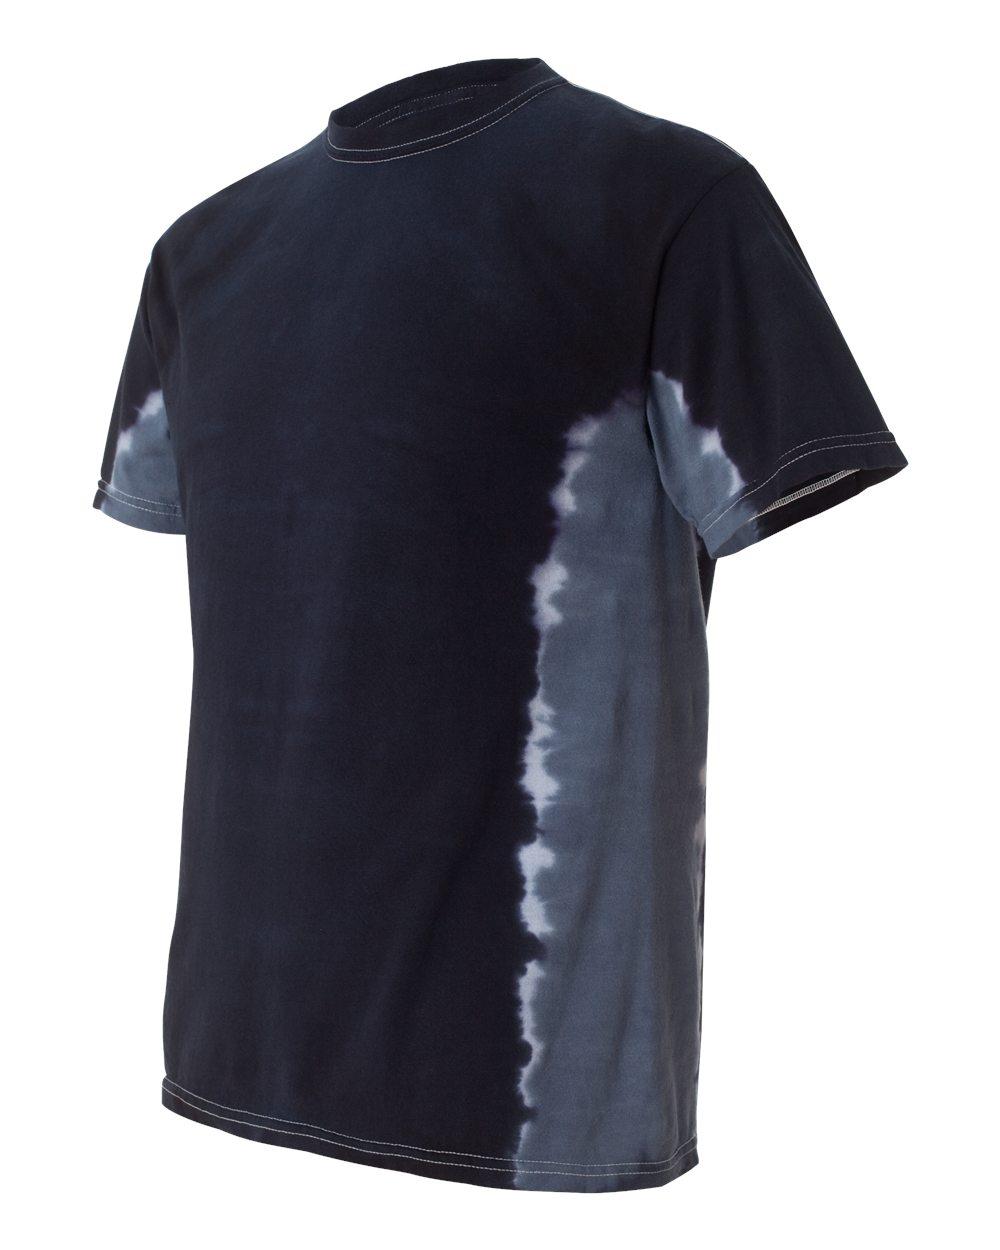 Tie-Dyed 200TB - Tonal T-Bone Short Sleeve T-Shirt